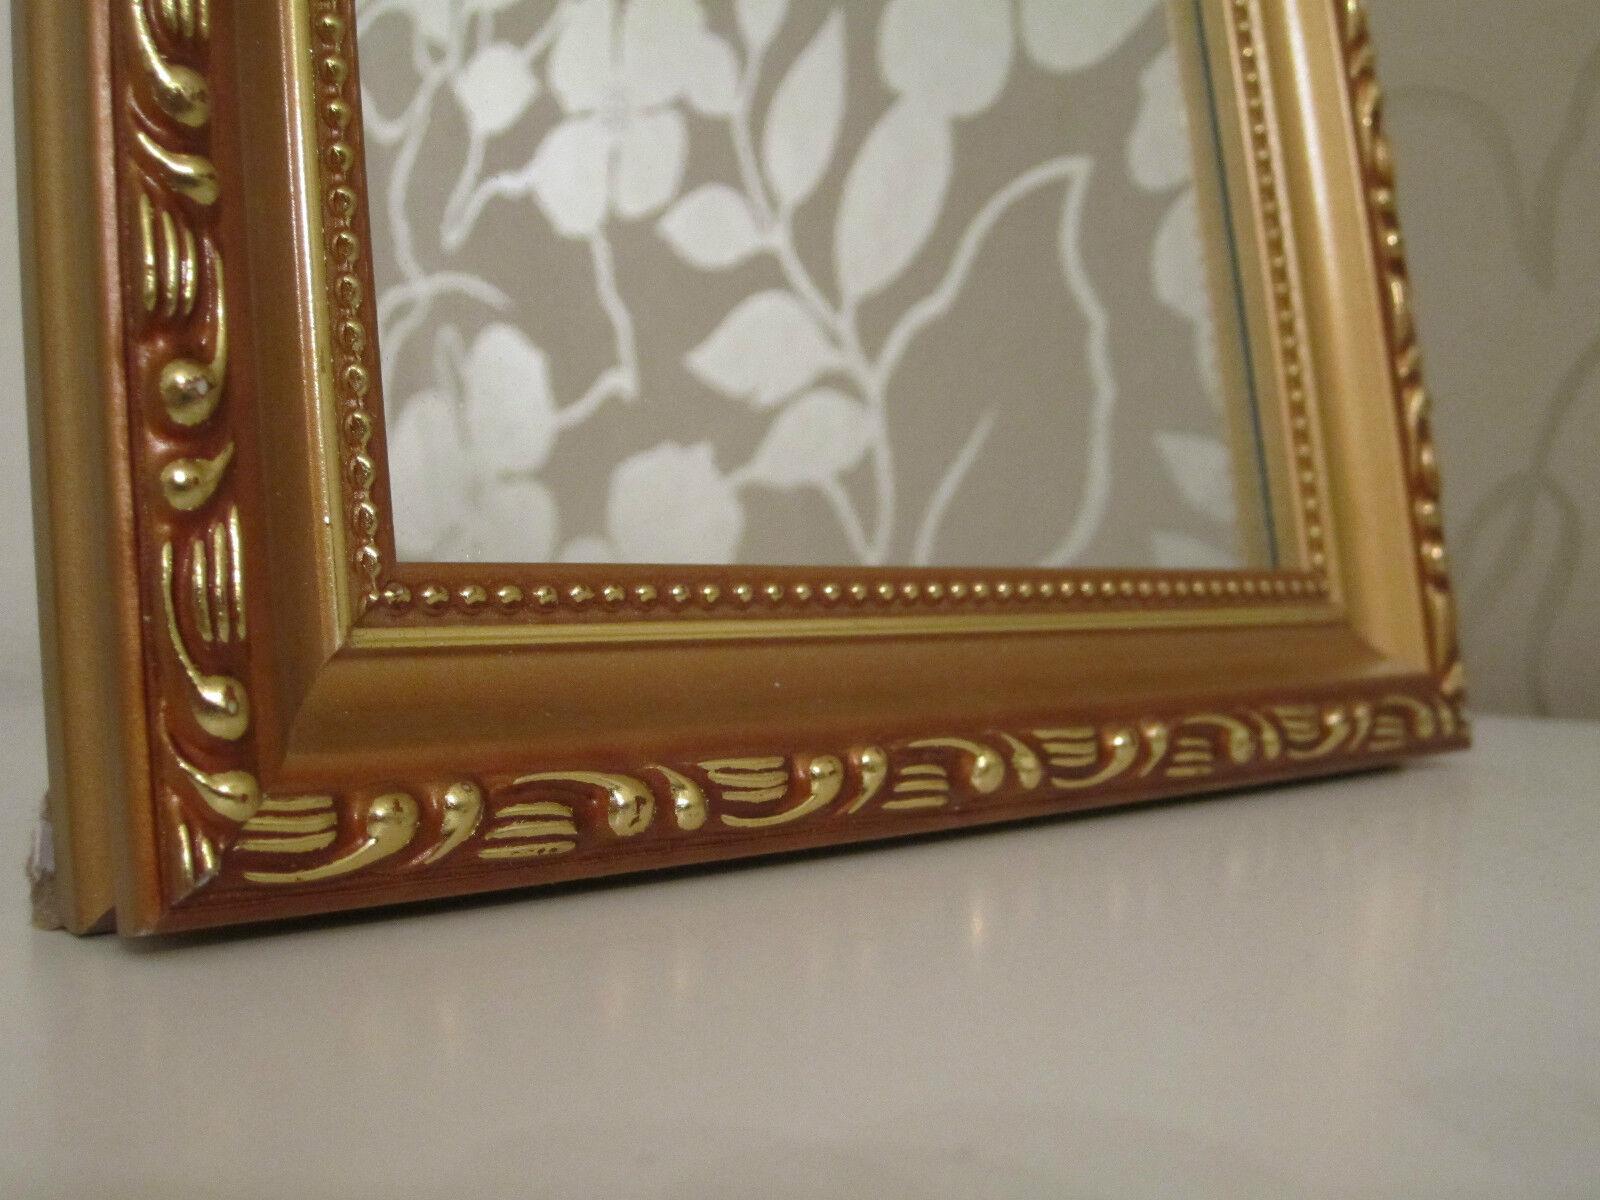 wundersch ner barock mini wandspiegel shabby antik look 20x25 cm gold neu wow ebay. Black Bedroom Furniture Sets. Home Design Ideas